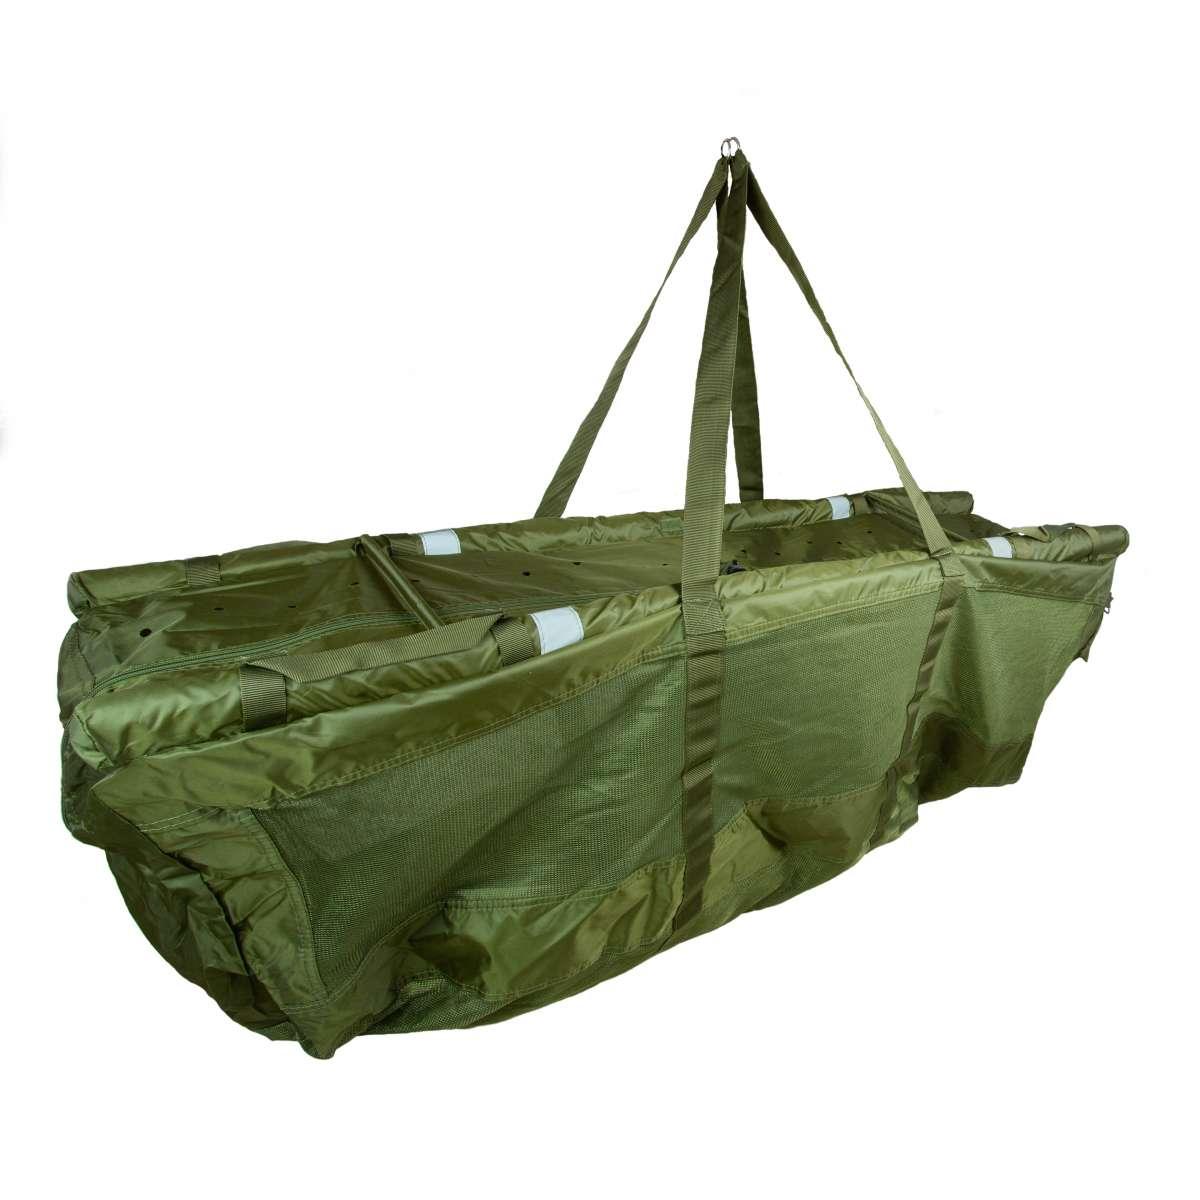 RCG retainer sling P4